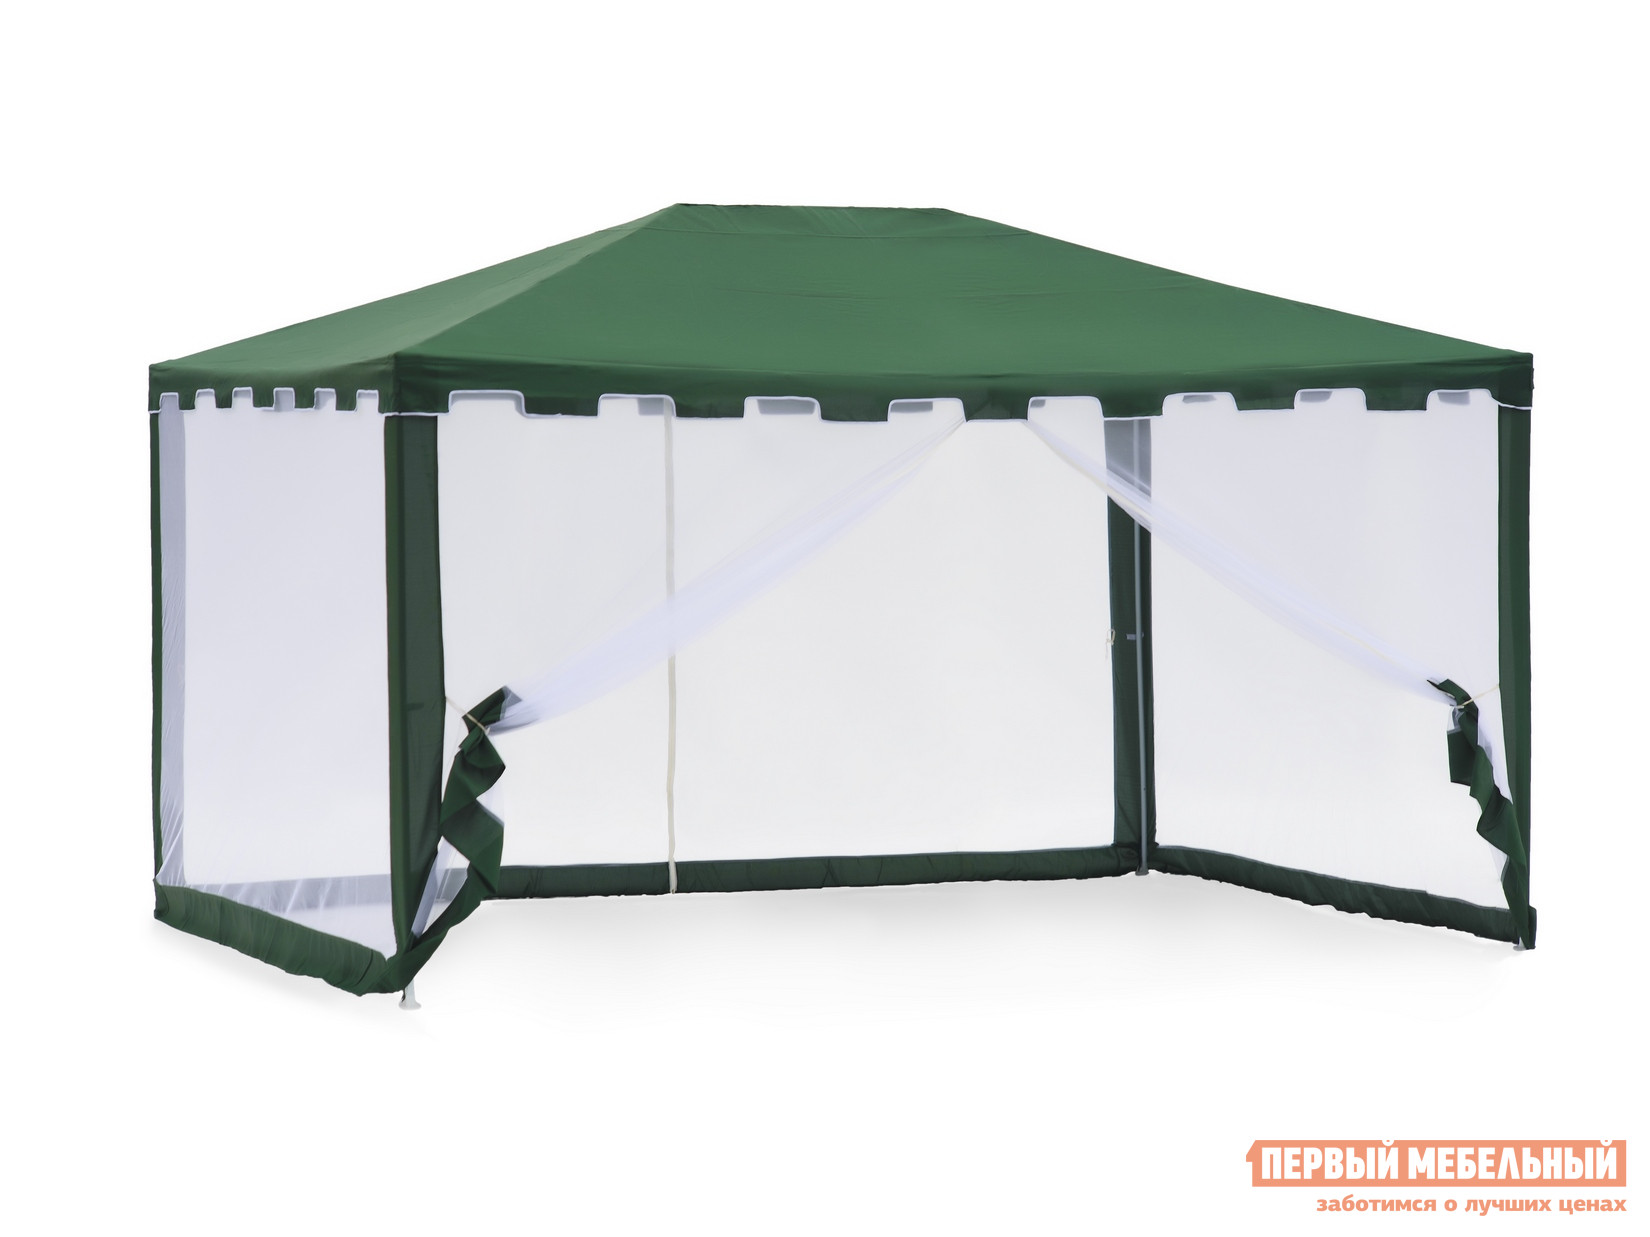 Антимоскитный шатер на металлическом каркасе Лекс групп Green Glade 1044